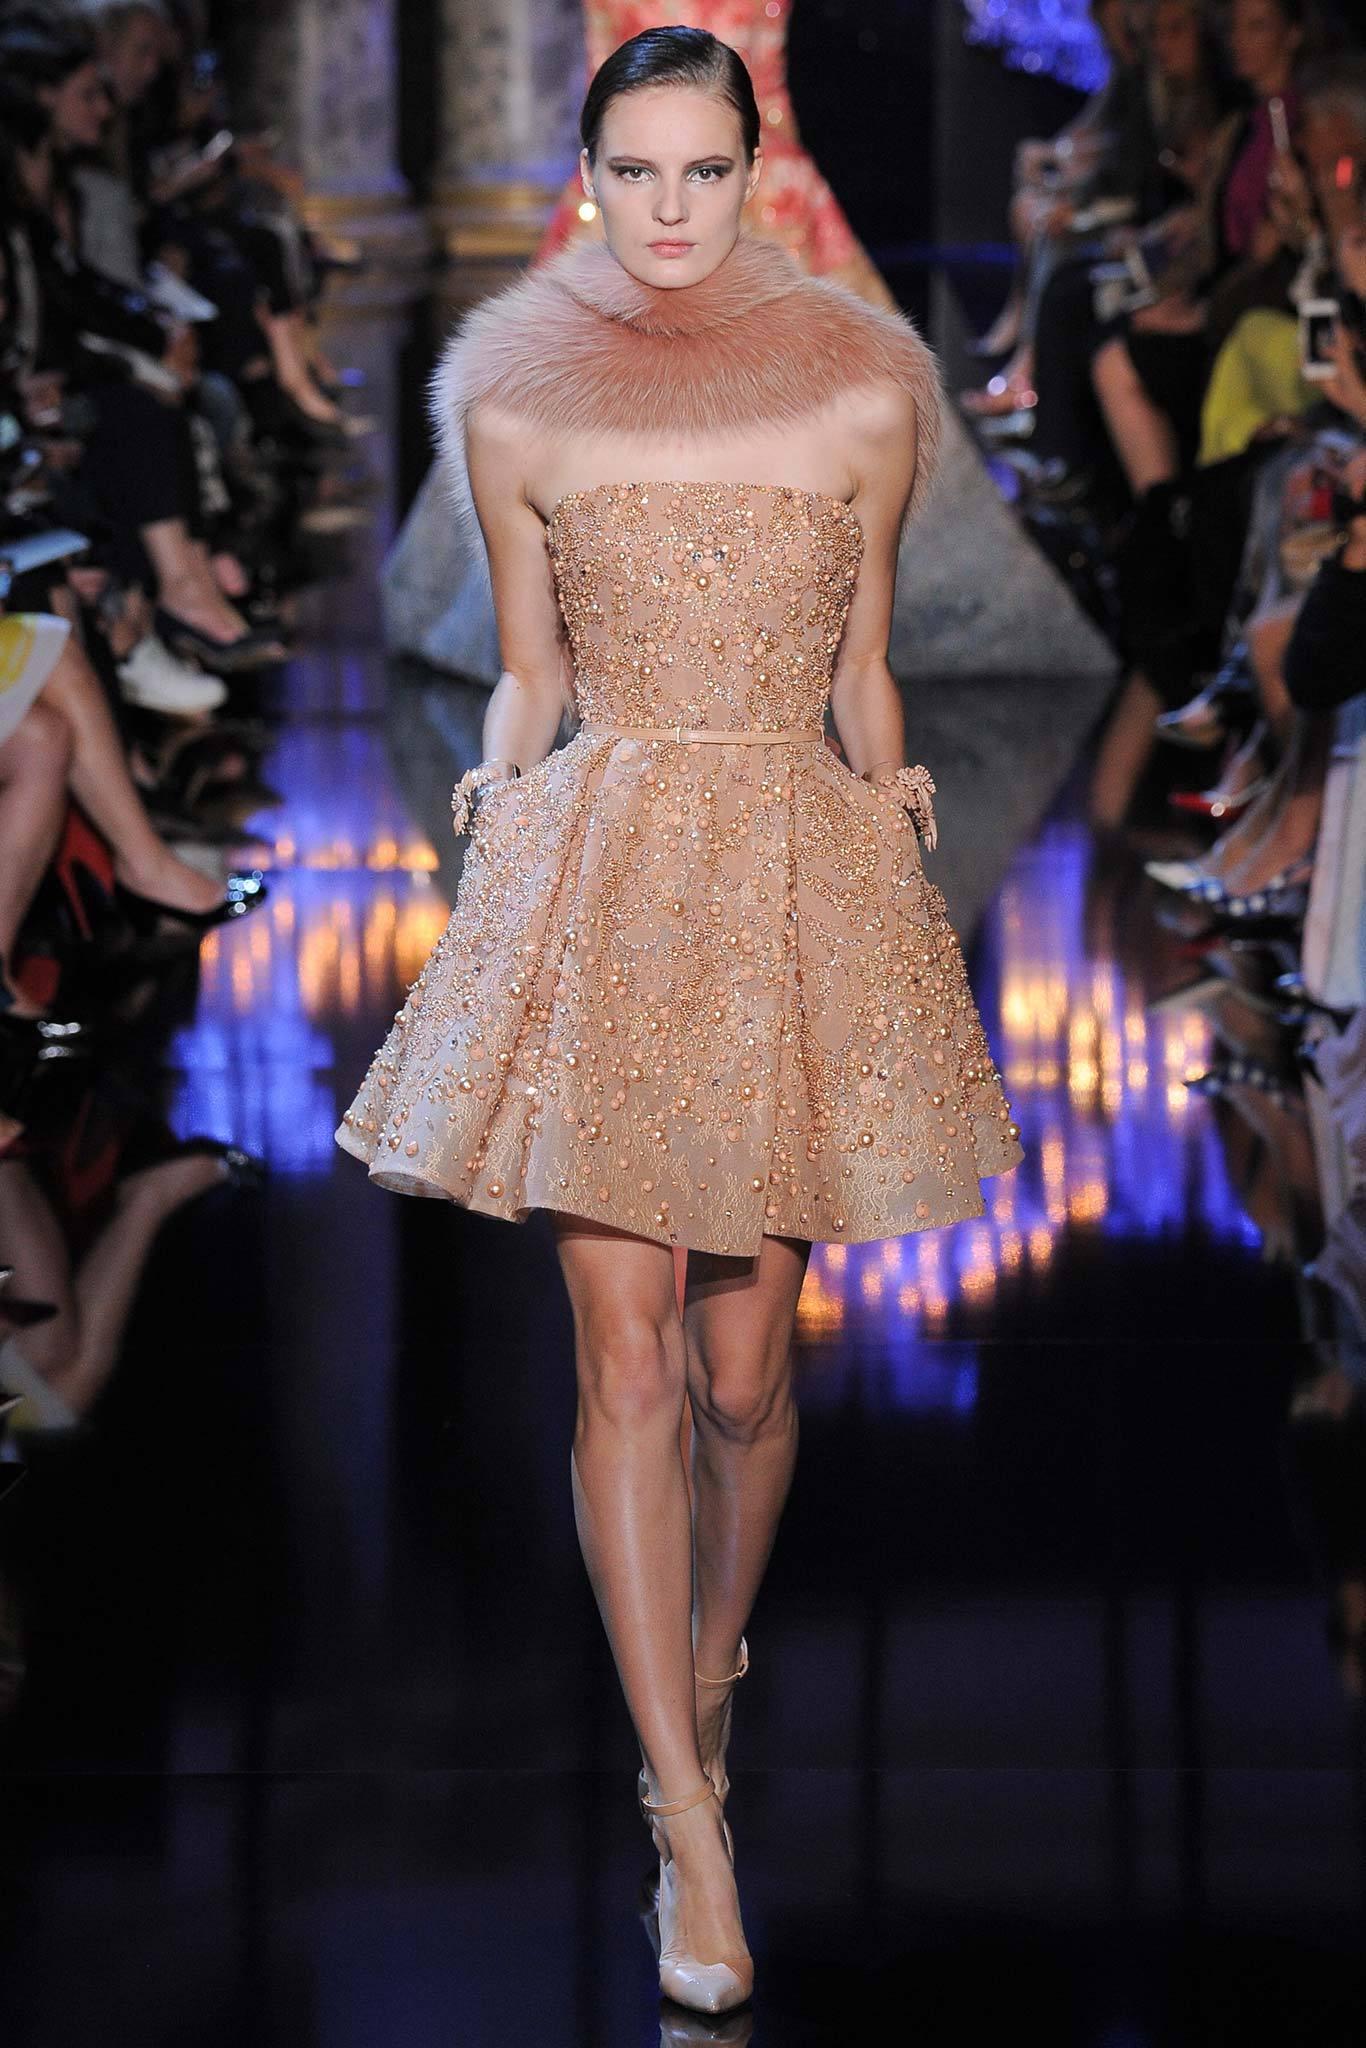 Elie-Saab-Couture-Fall2014-11.JPG